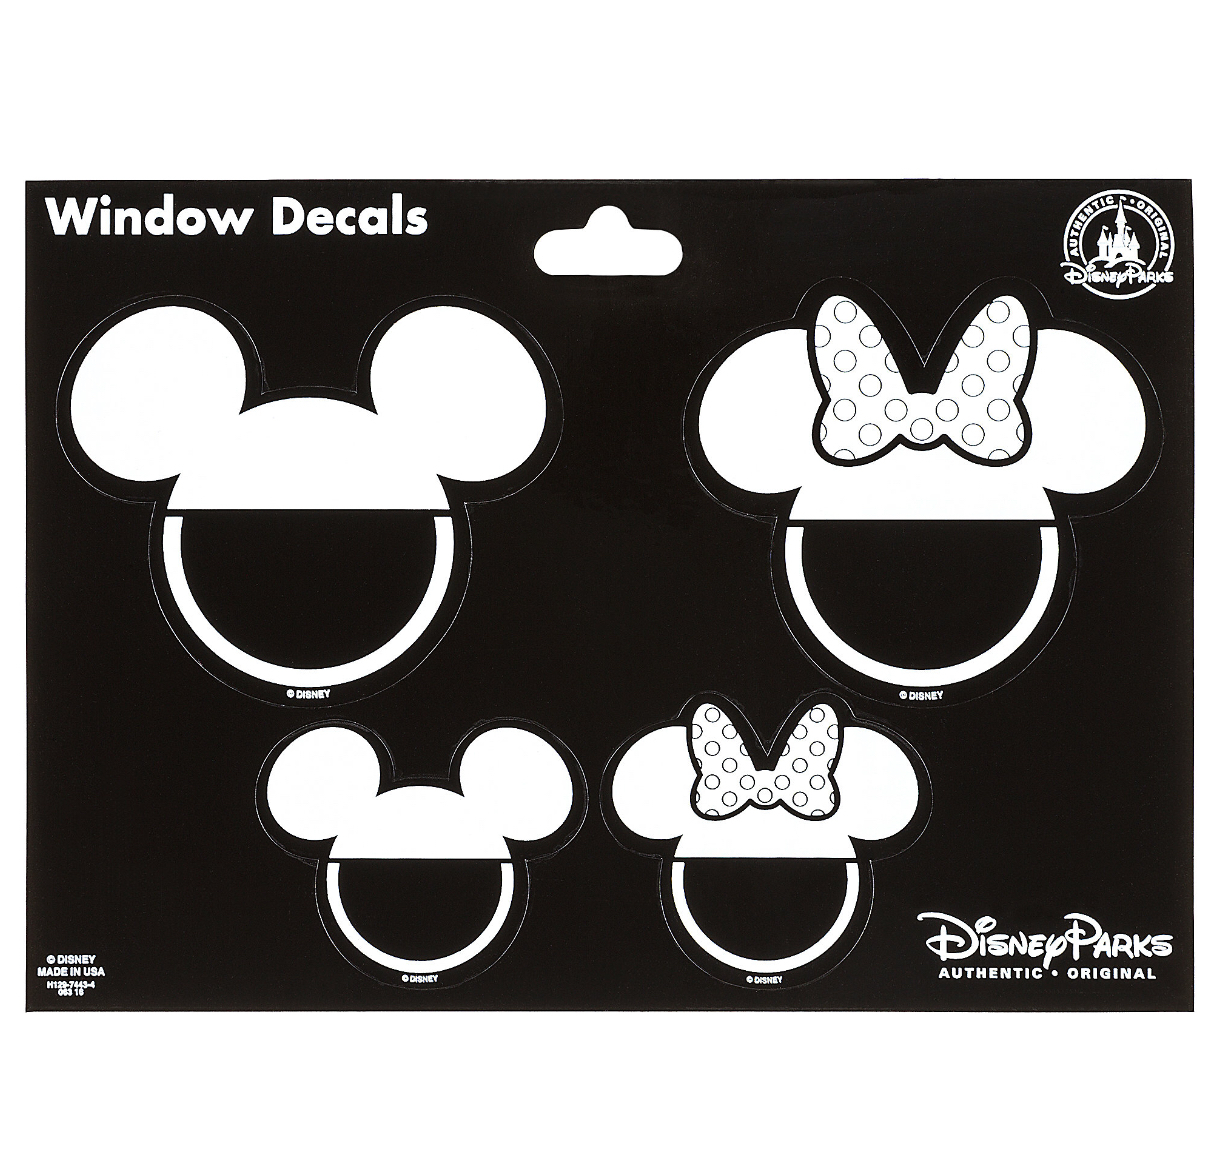 Mickeydecalset